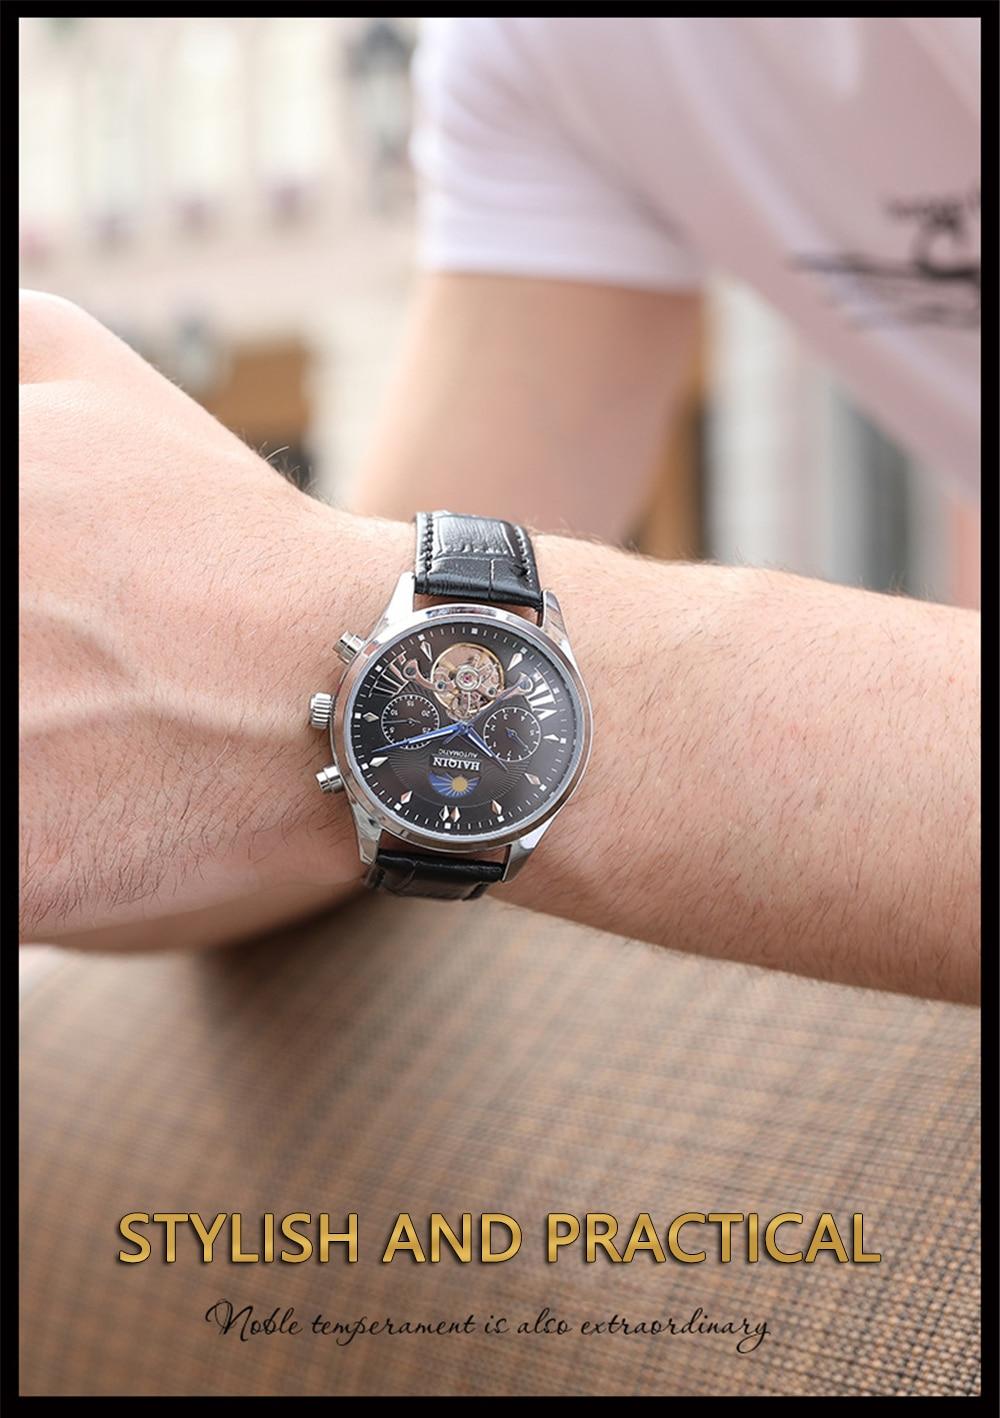 Haiqin masculinomasculino relógios marca superior luxo automáticomecânicorelógio